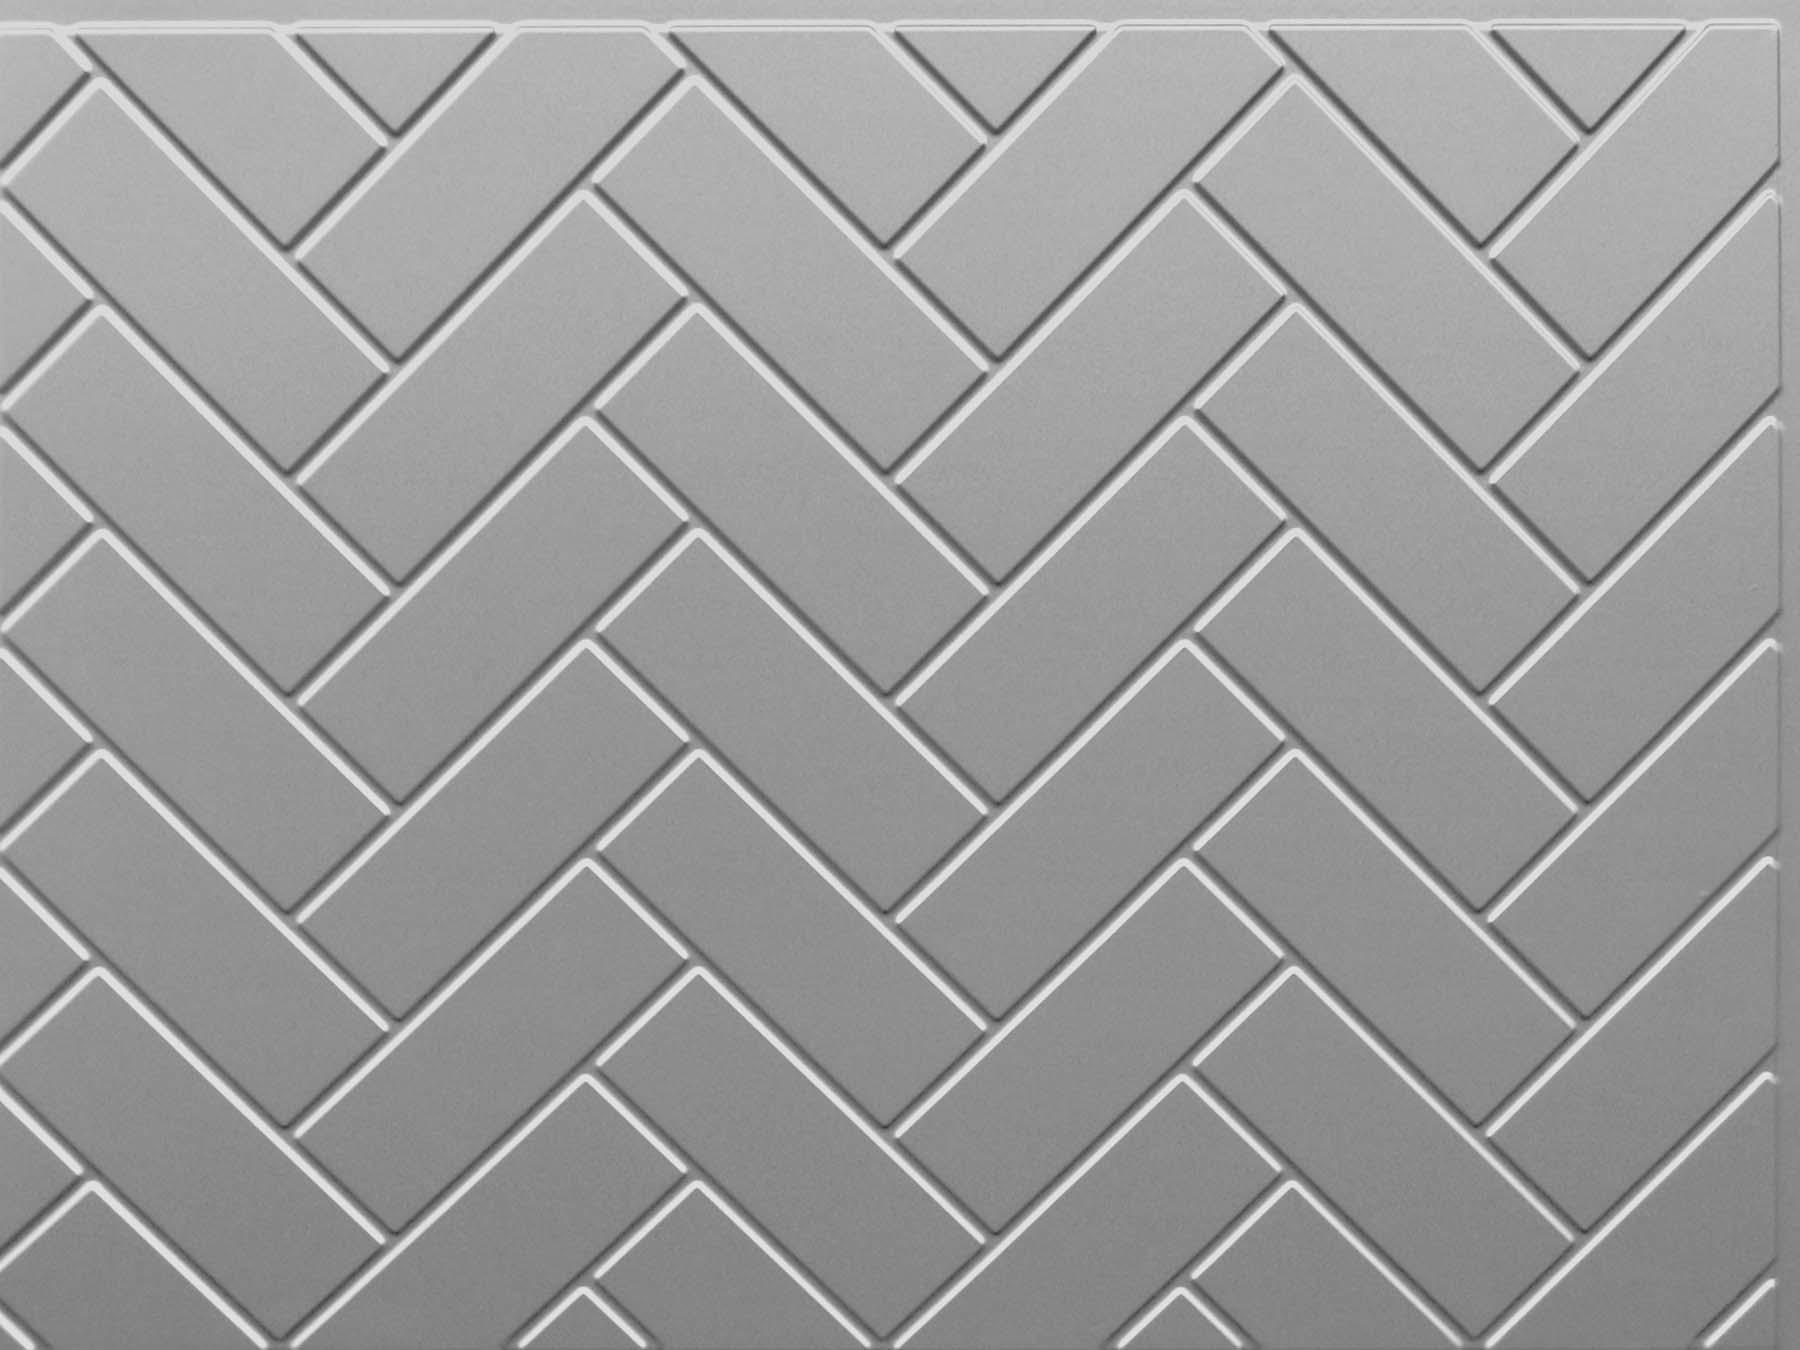 Herringbone Tile (Sample) | ATI Decorative Laminates